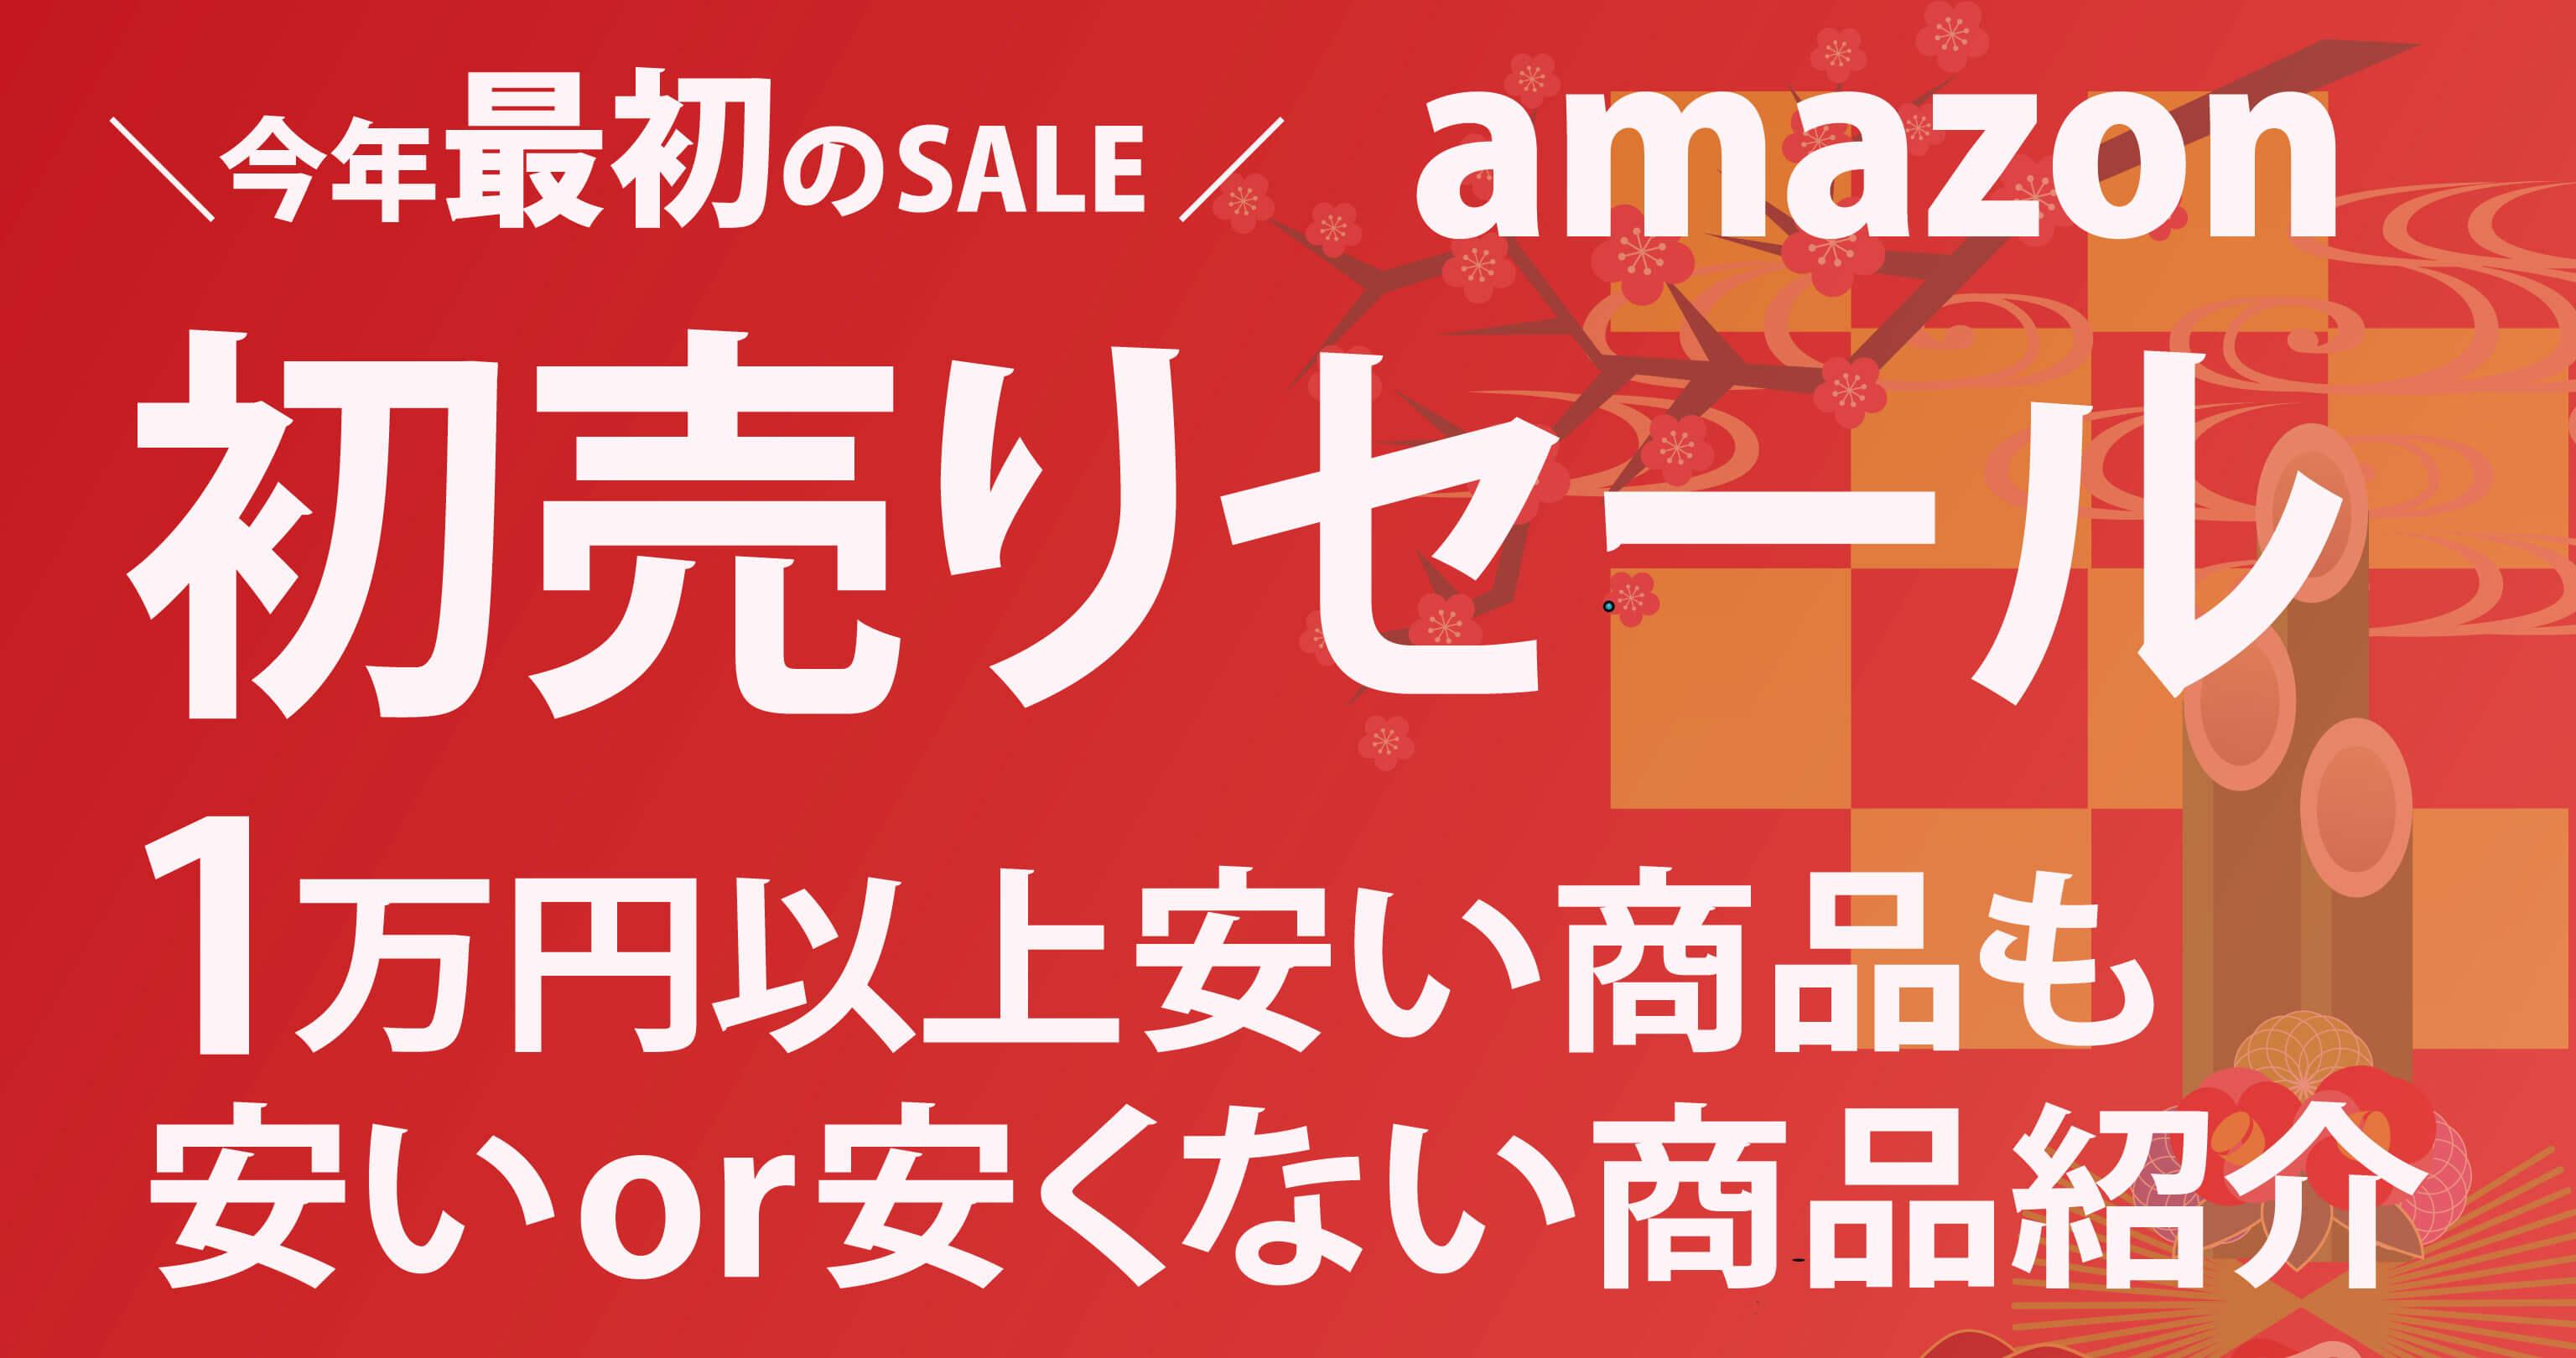 Amazon新春初売りセールオトクな商品(割引額が大きい商品)や安くない商品を調べてみた